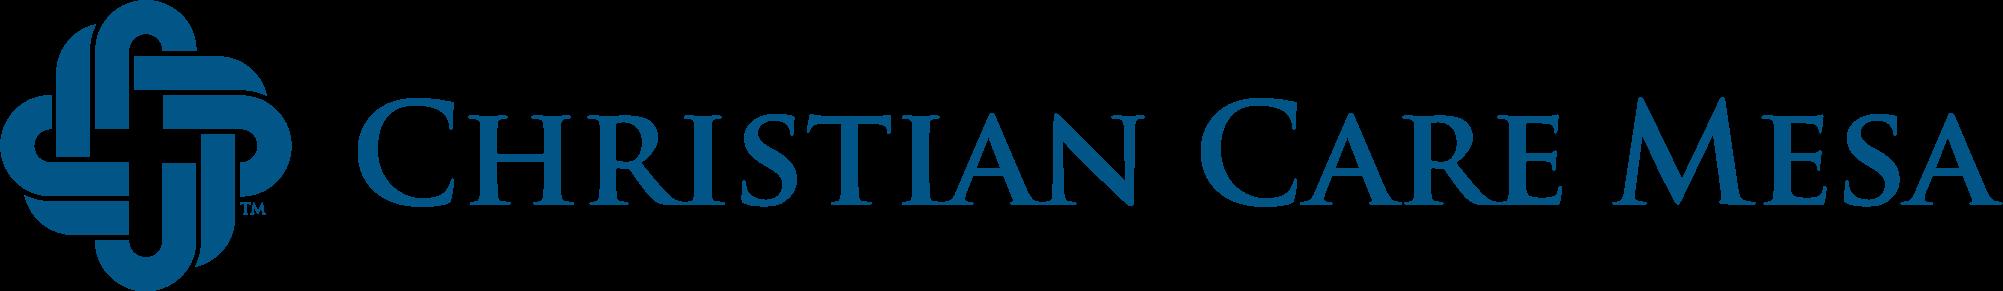 Christian Care Mesa Logo